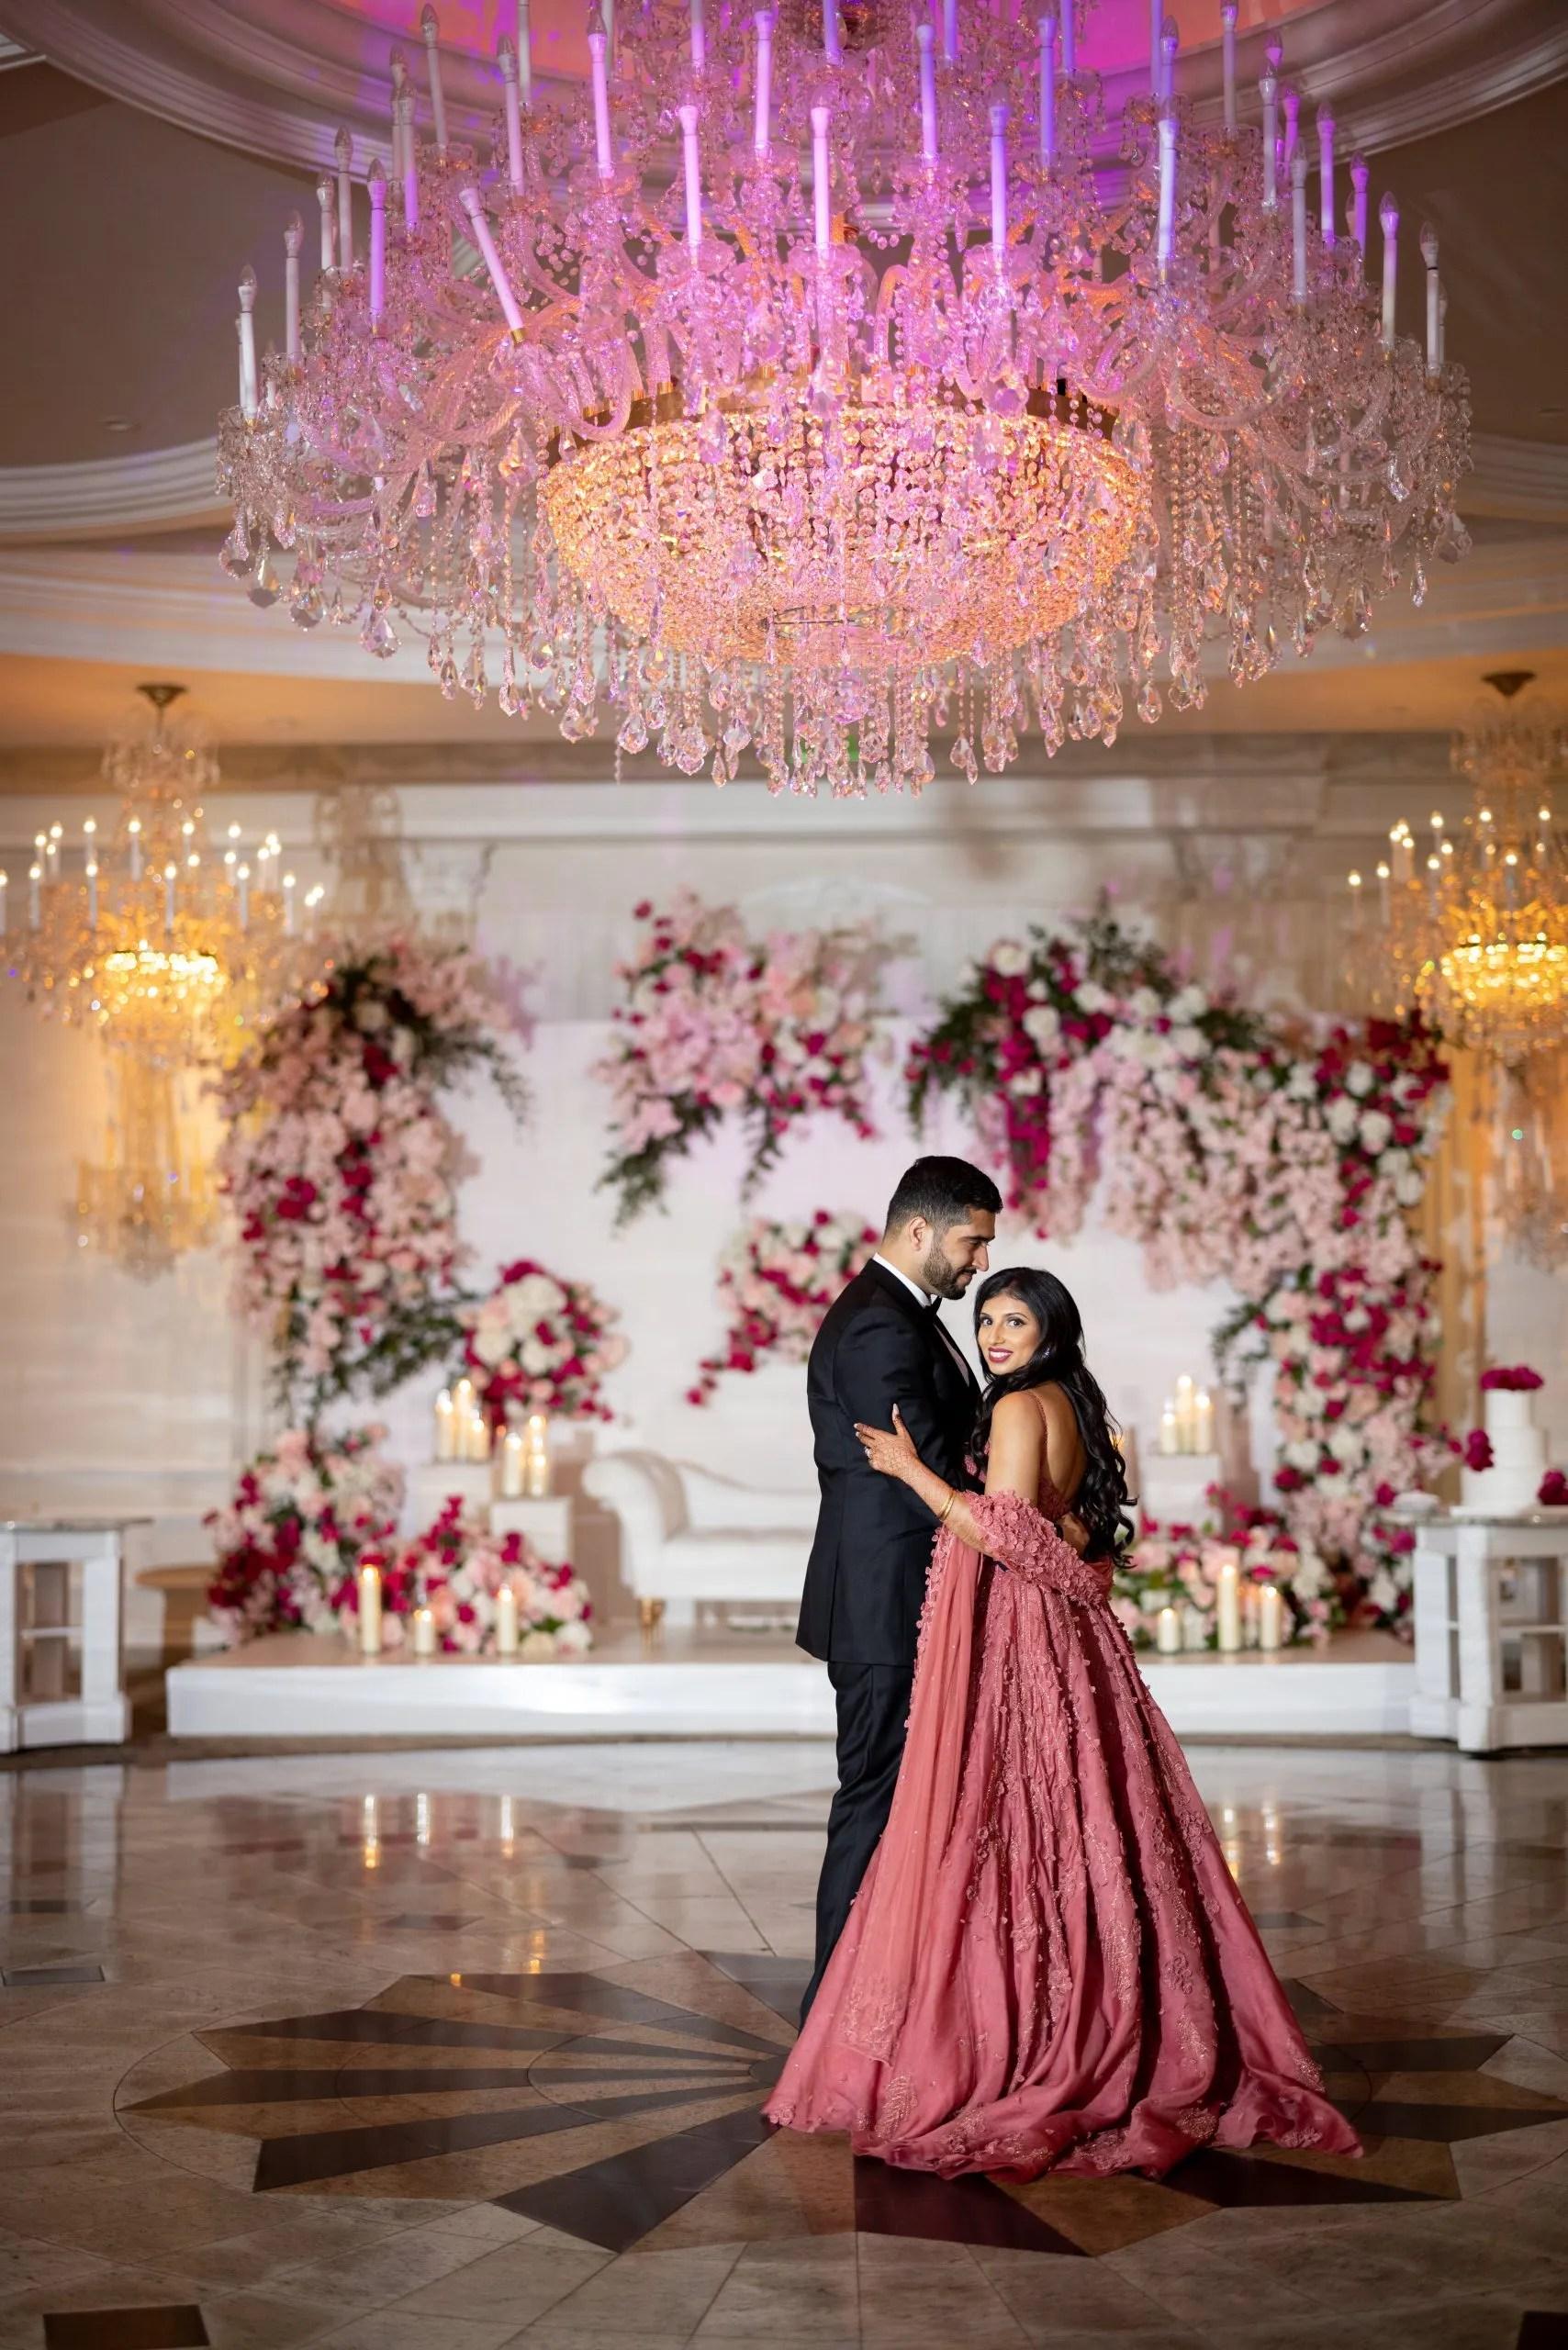 6 - Meghana and Nikhil Wedding - Akbar Sayed Photography